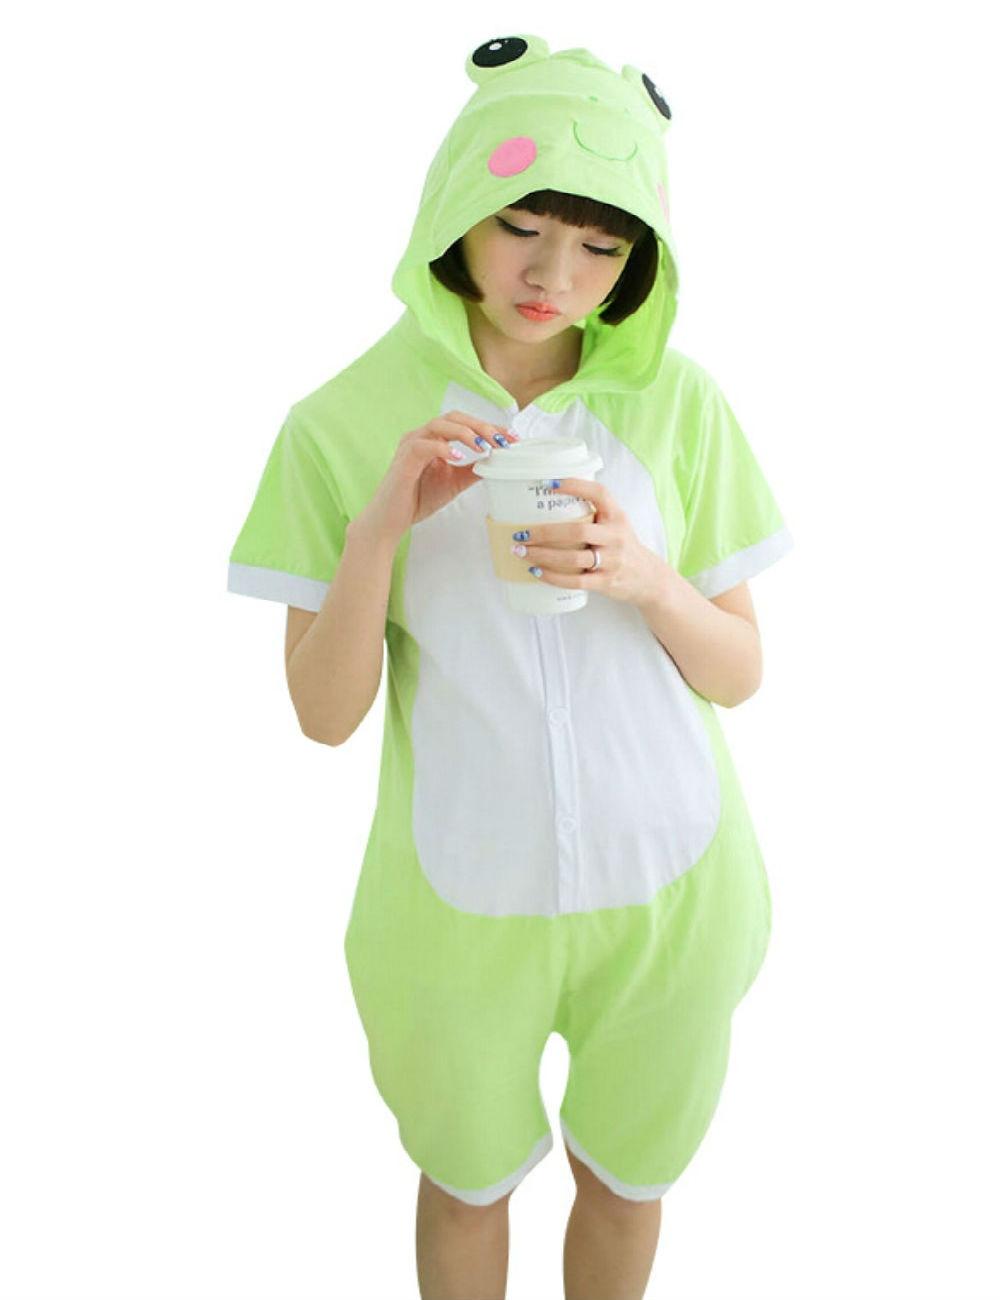 f3a88d7855fa Detail Feedback Questions about Cartoon Anime frog Cosplay Costume Summer  Jumpsuit Short Sleeve Animals frog Pajamas Pyjamas Onesie Adult Kid  Sleepwear ...